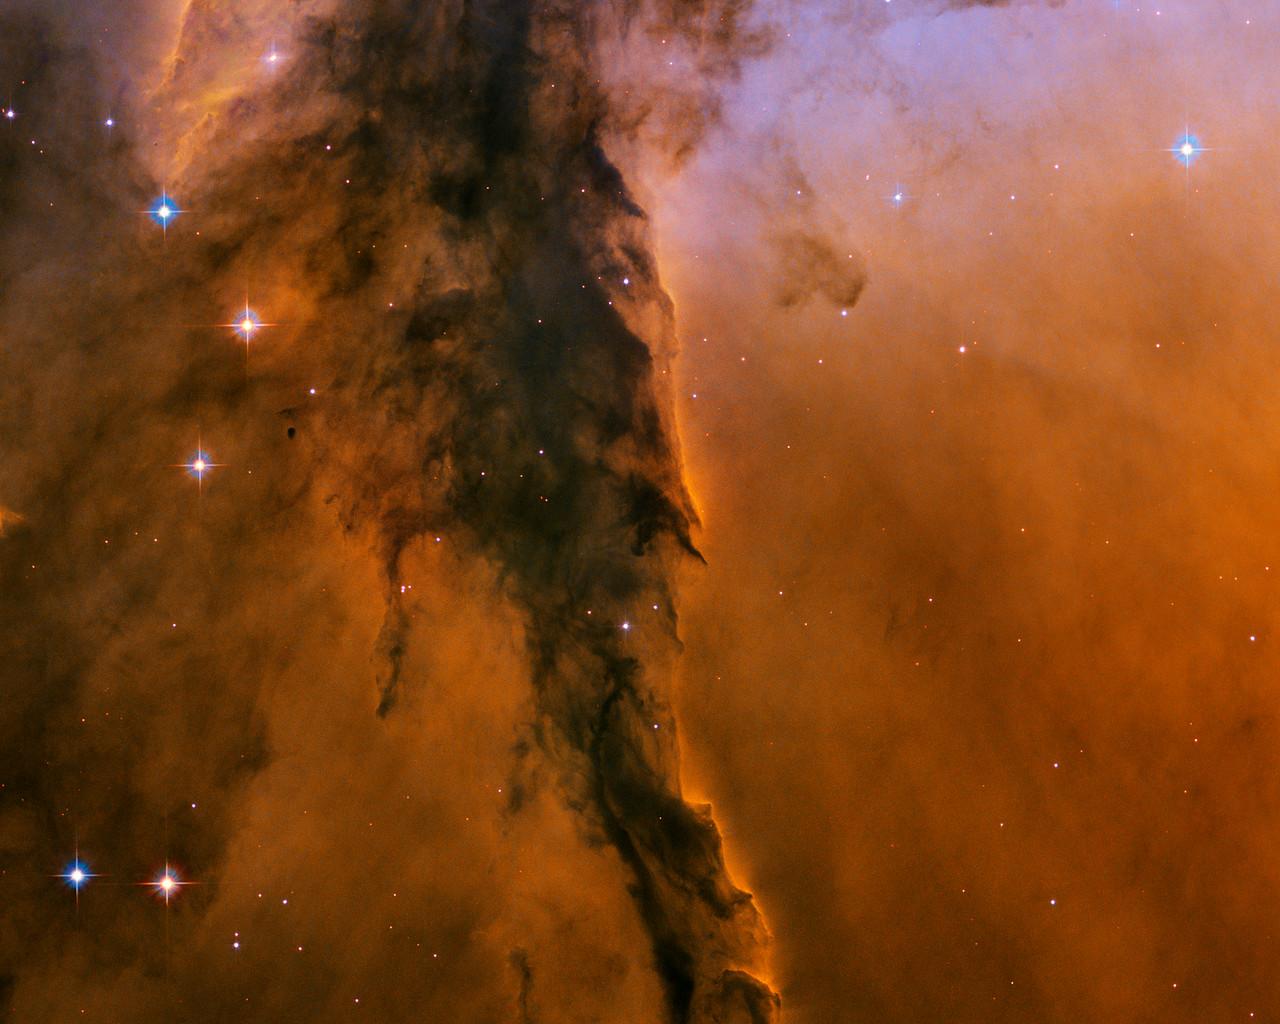 Eagle Nebula, Hubble Space Telescope.